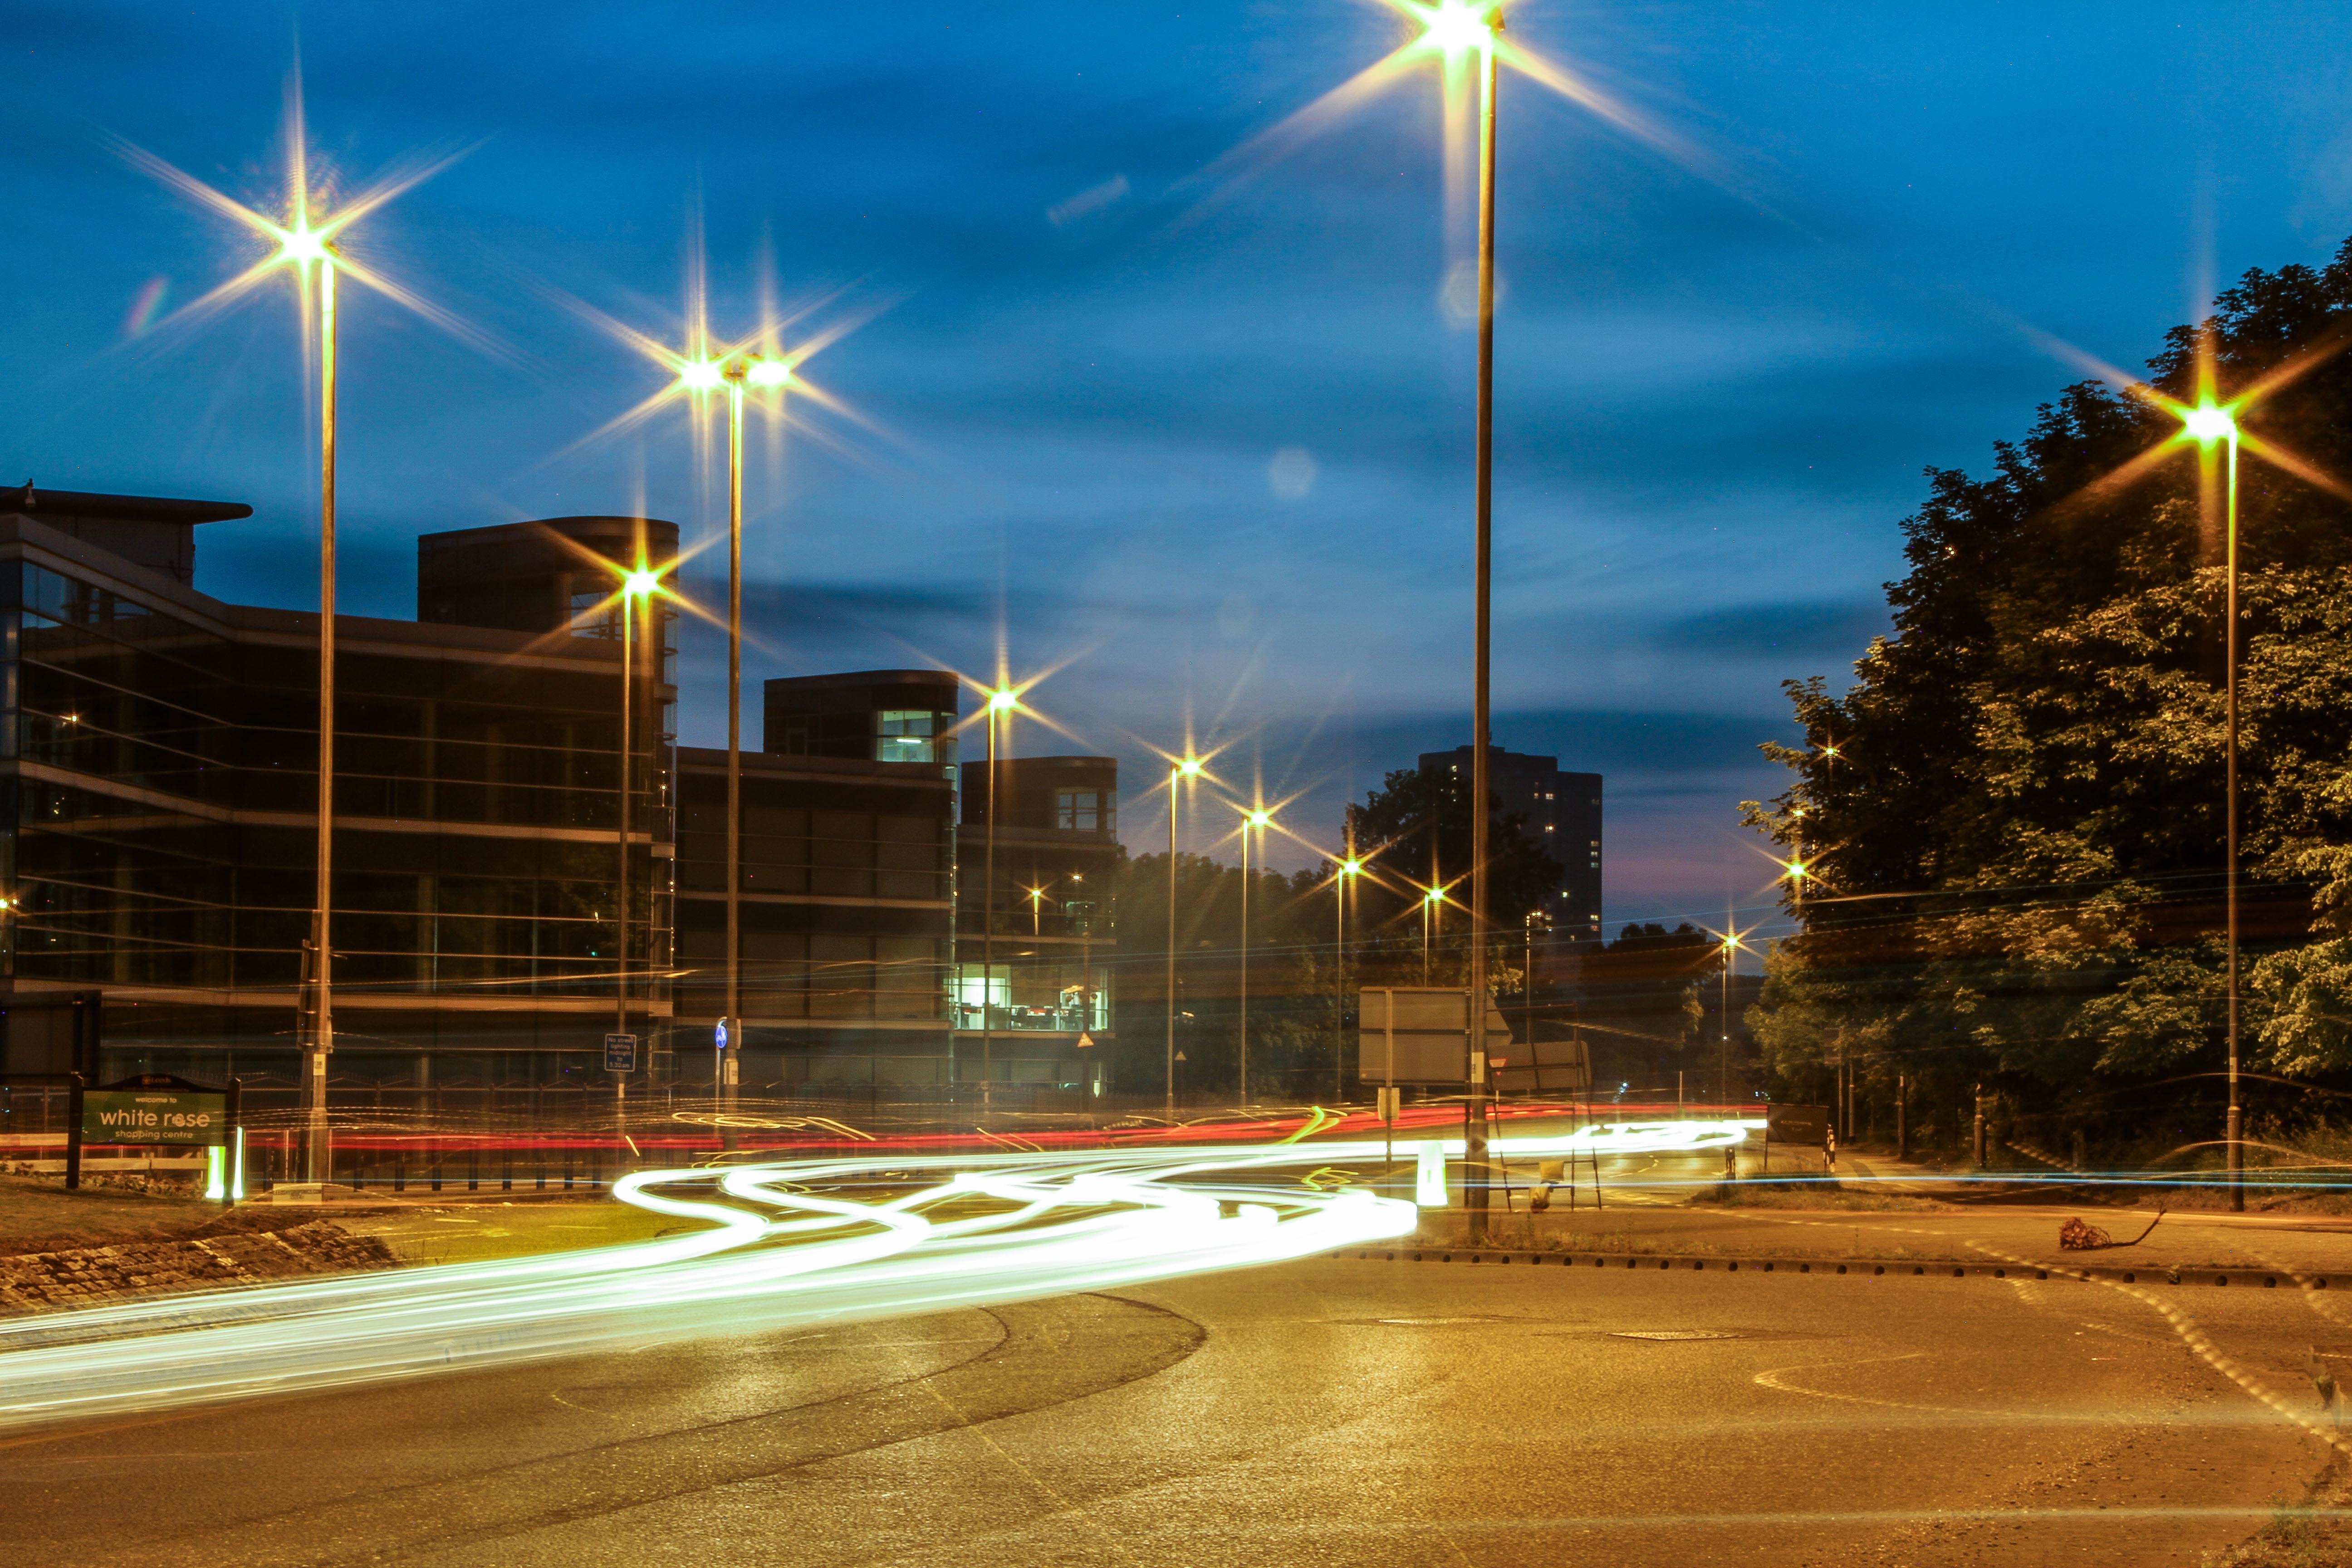 Free stock photo of car lights, city lights